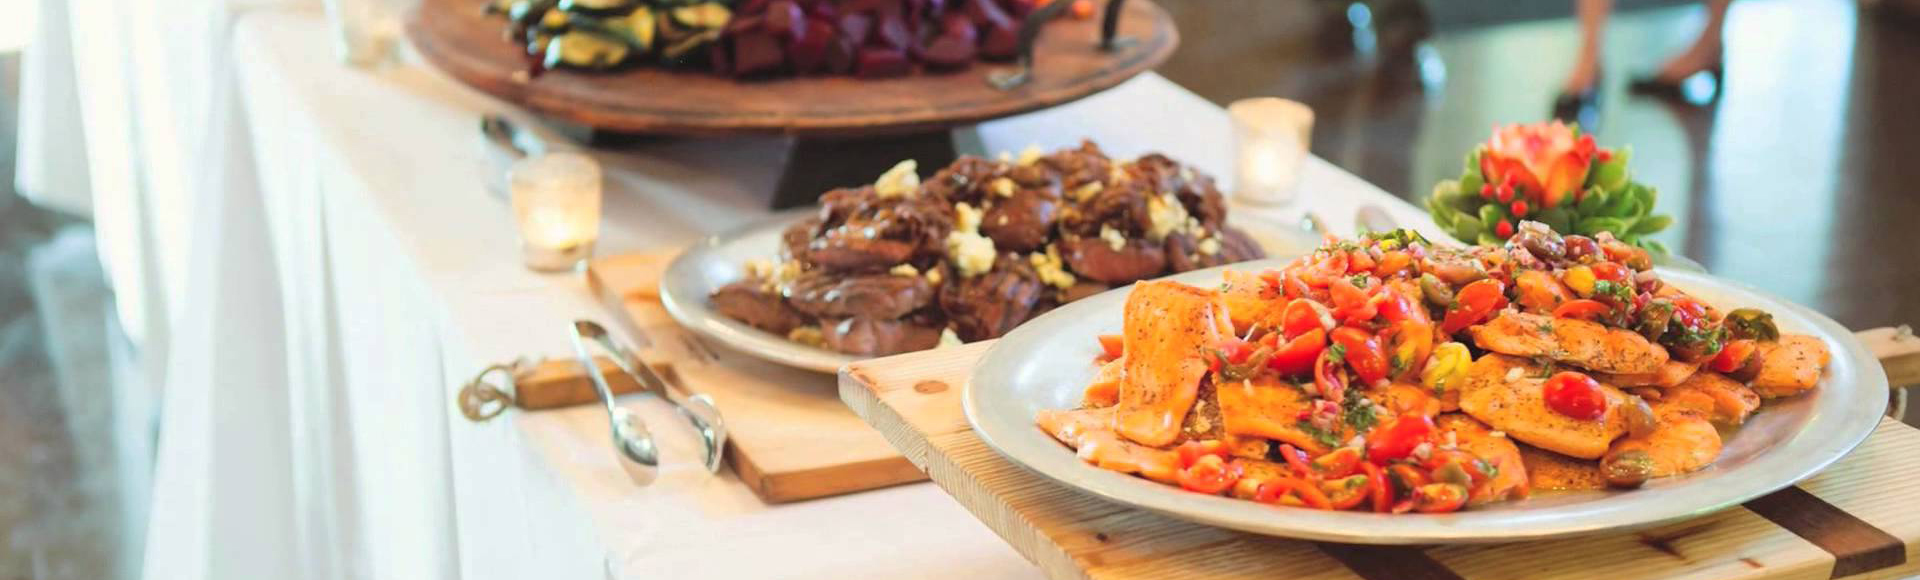 Catering Hizmeti Ankara